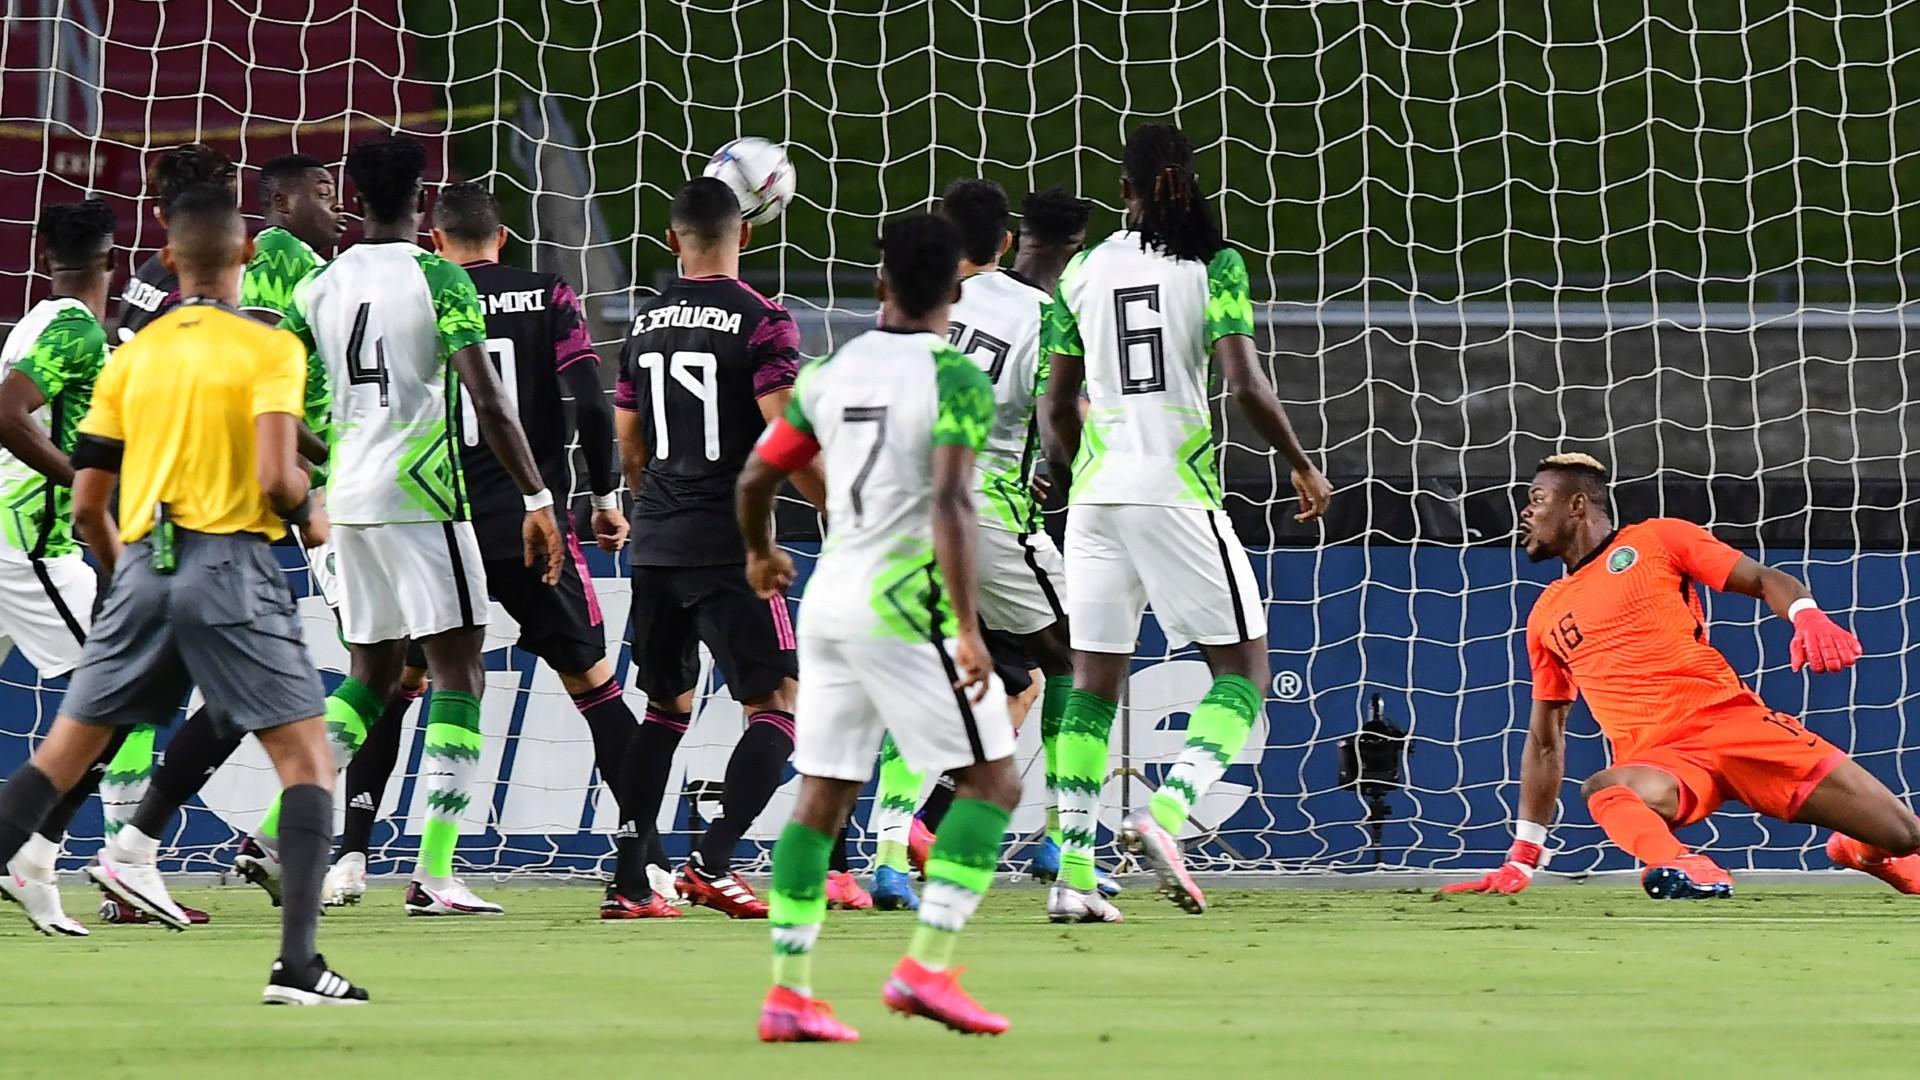 Nigeria vs Mexico: Why the Super Eagles got pummeled by El Tri